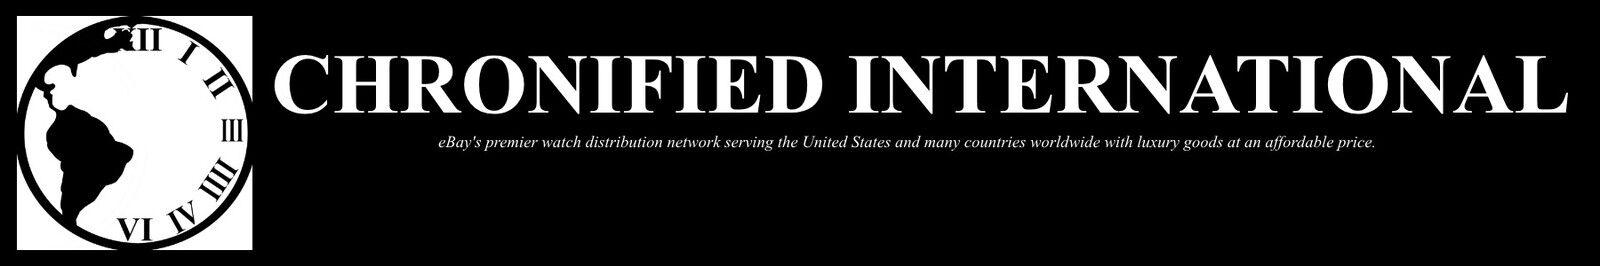 Chronified International